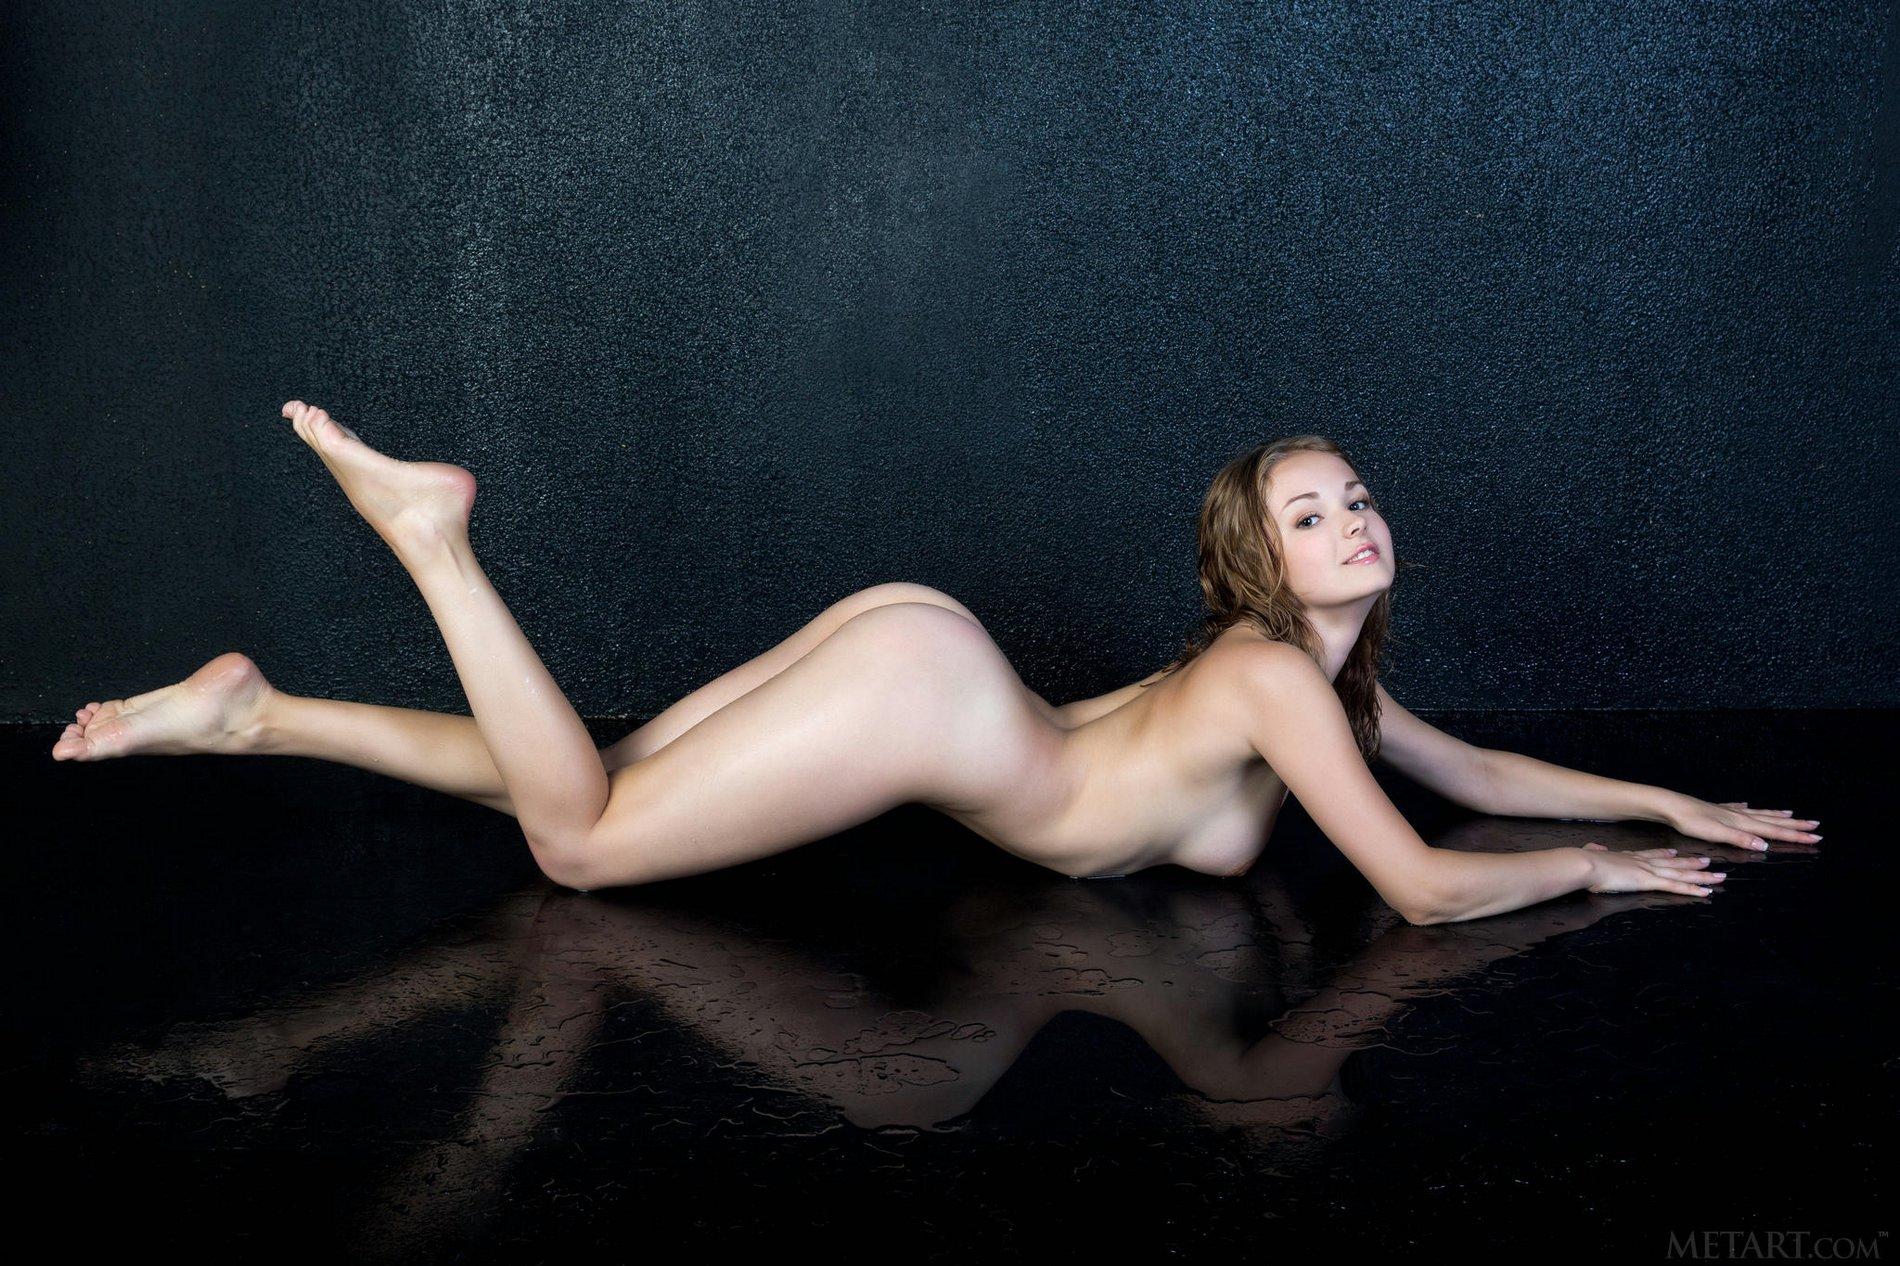 Lucille b nude